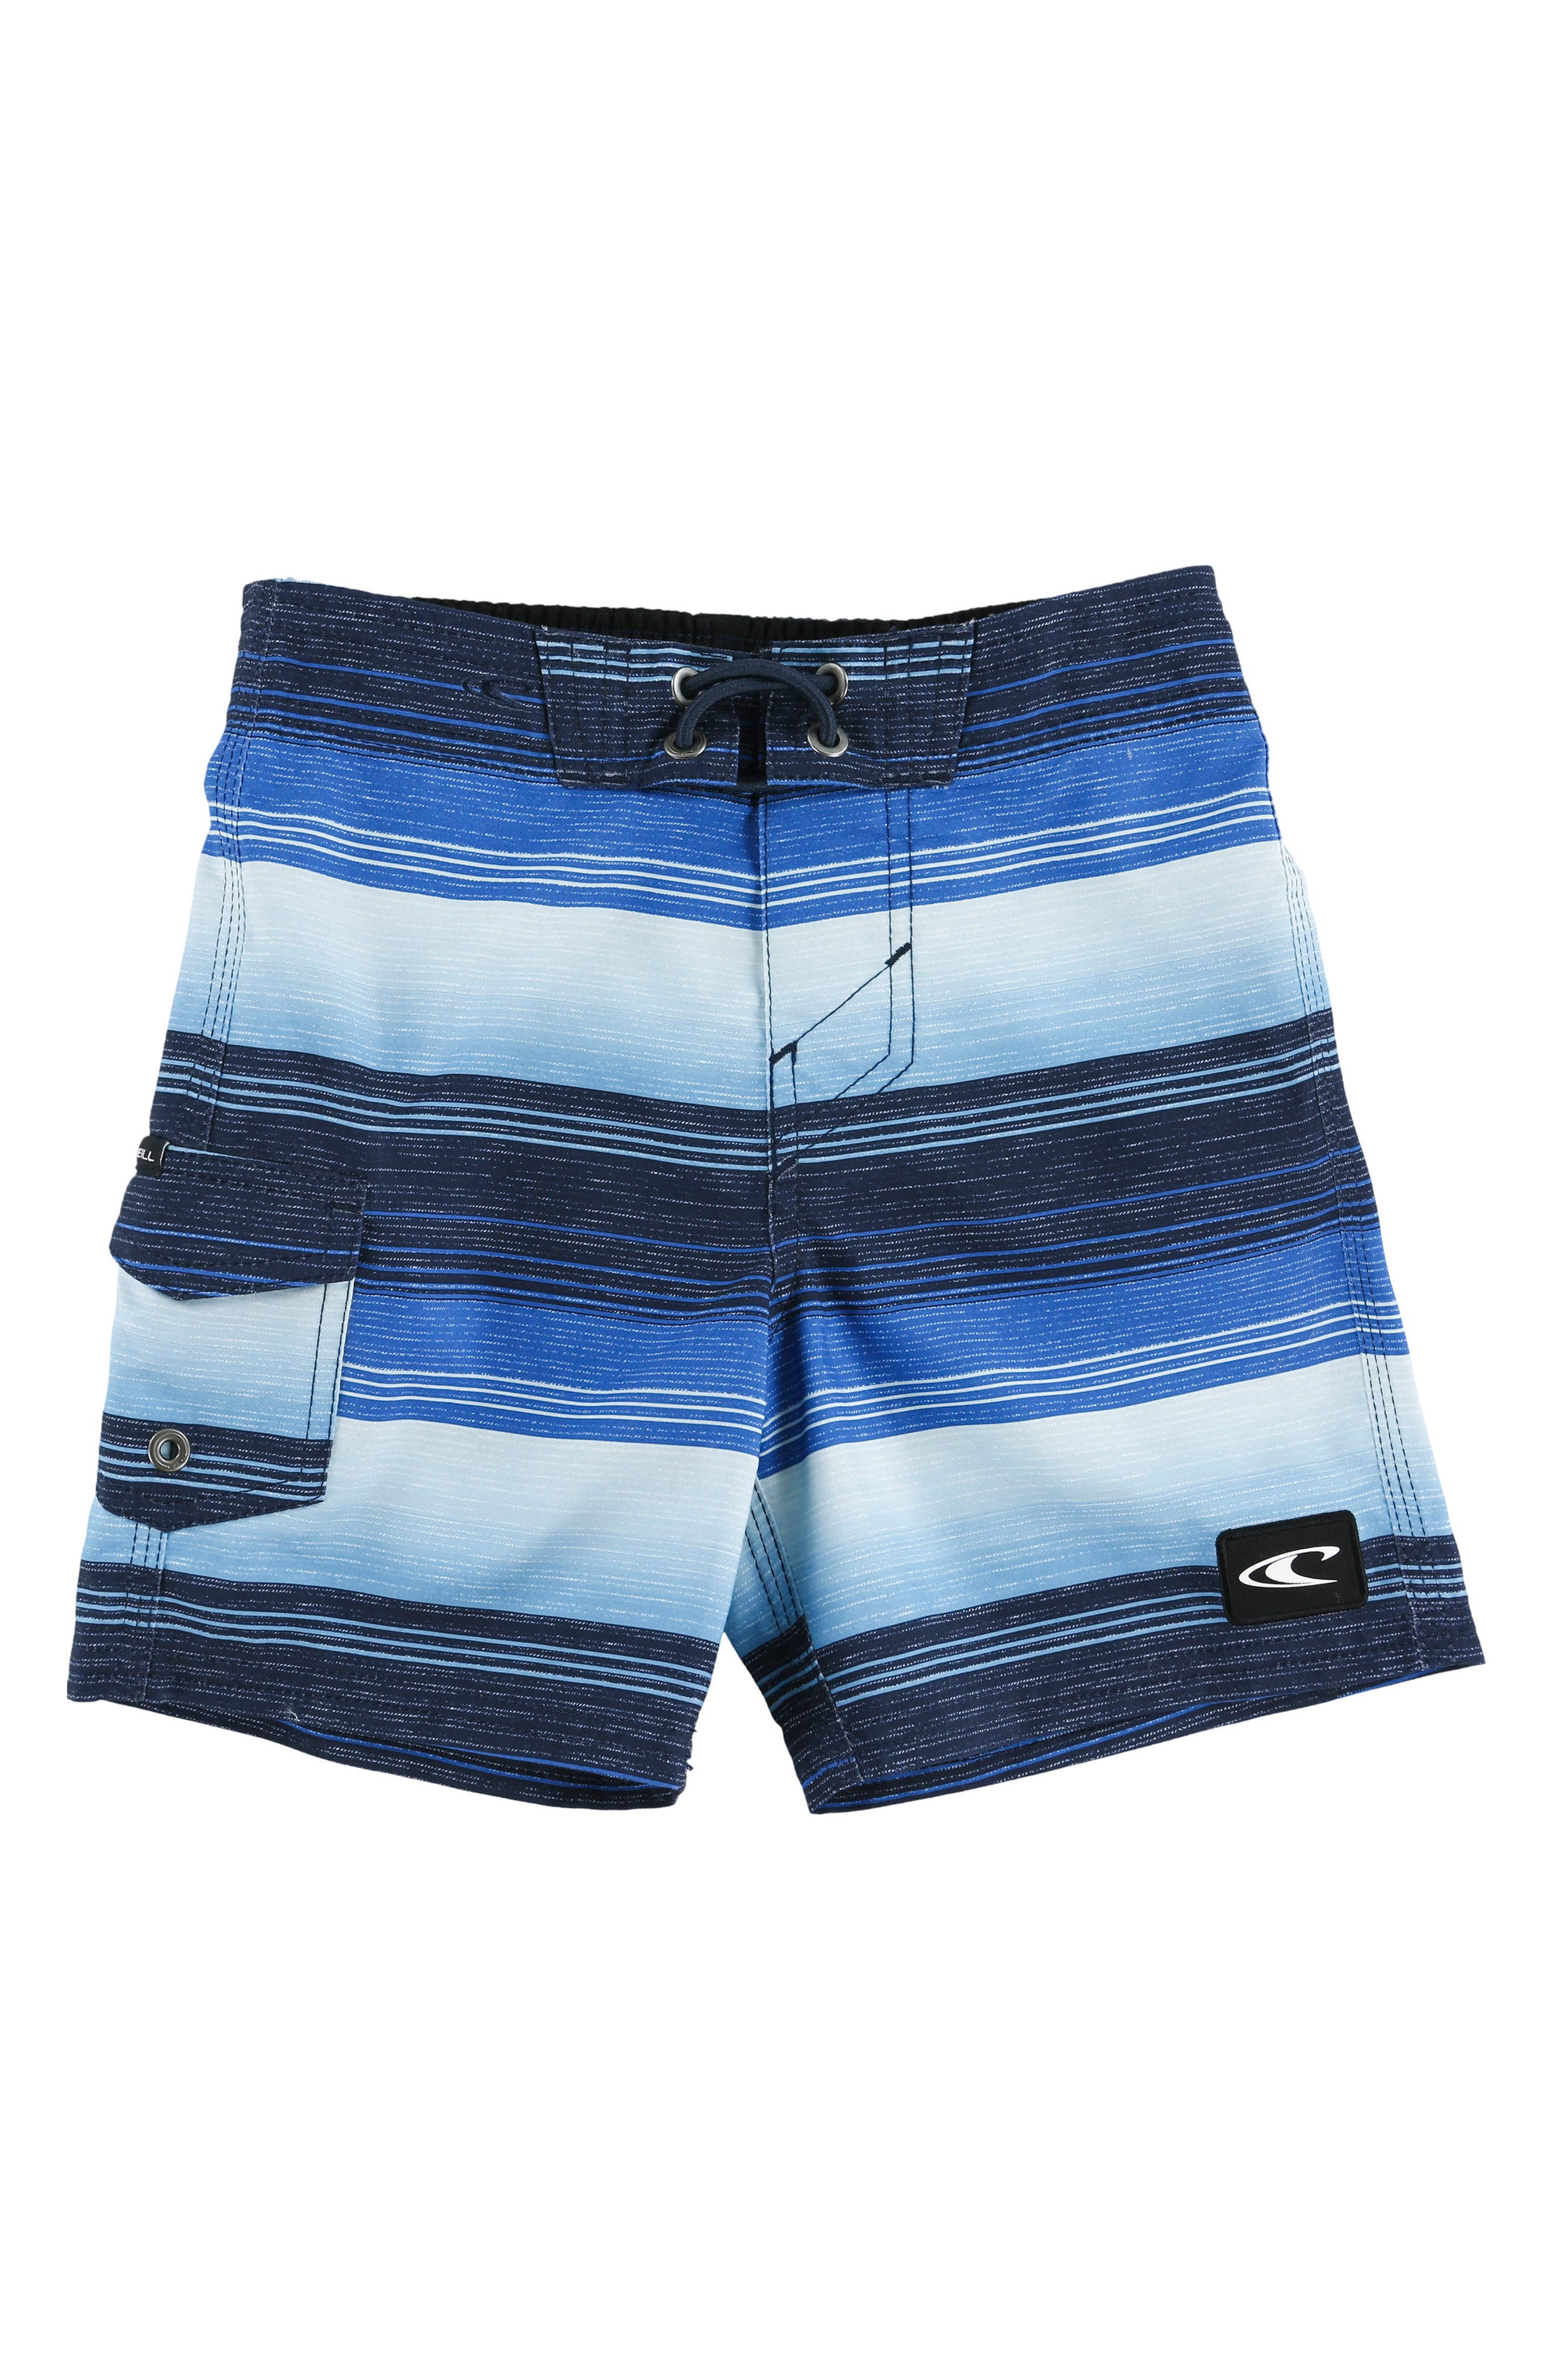 Main Image - O'Neill Santa Cruz Stripe Board Shorts (Toddler Boys)